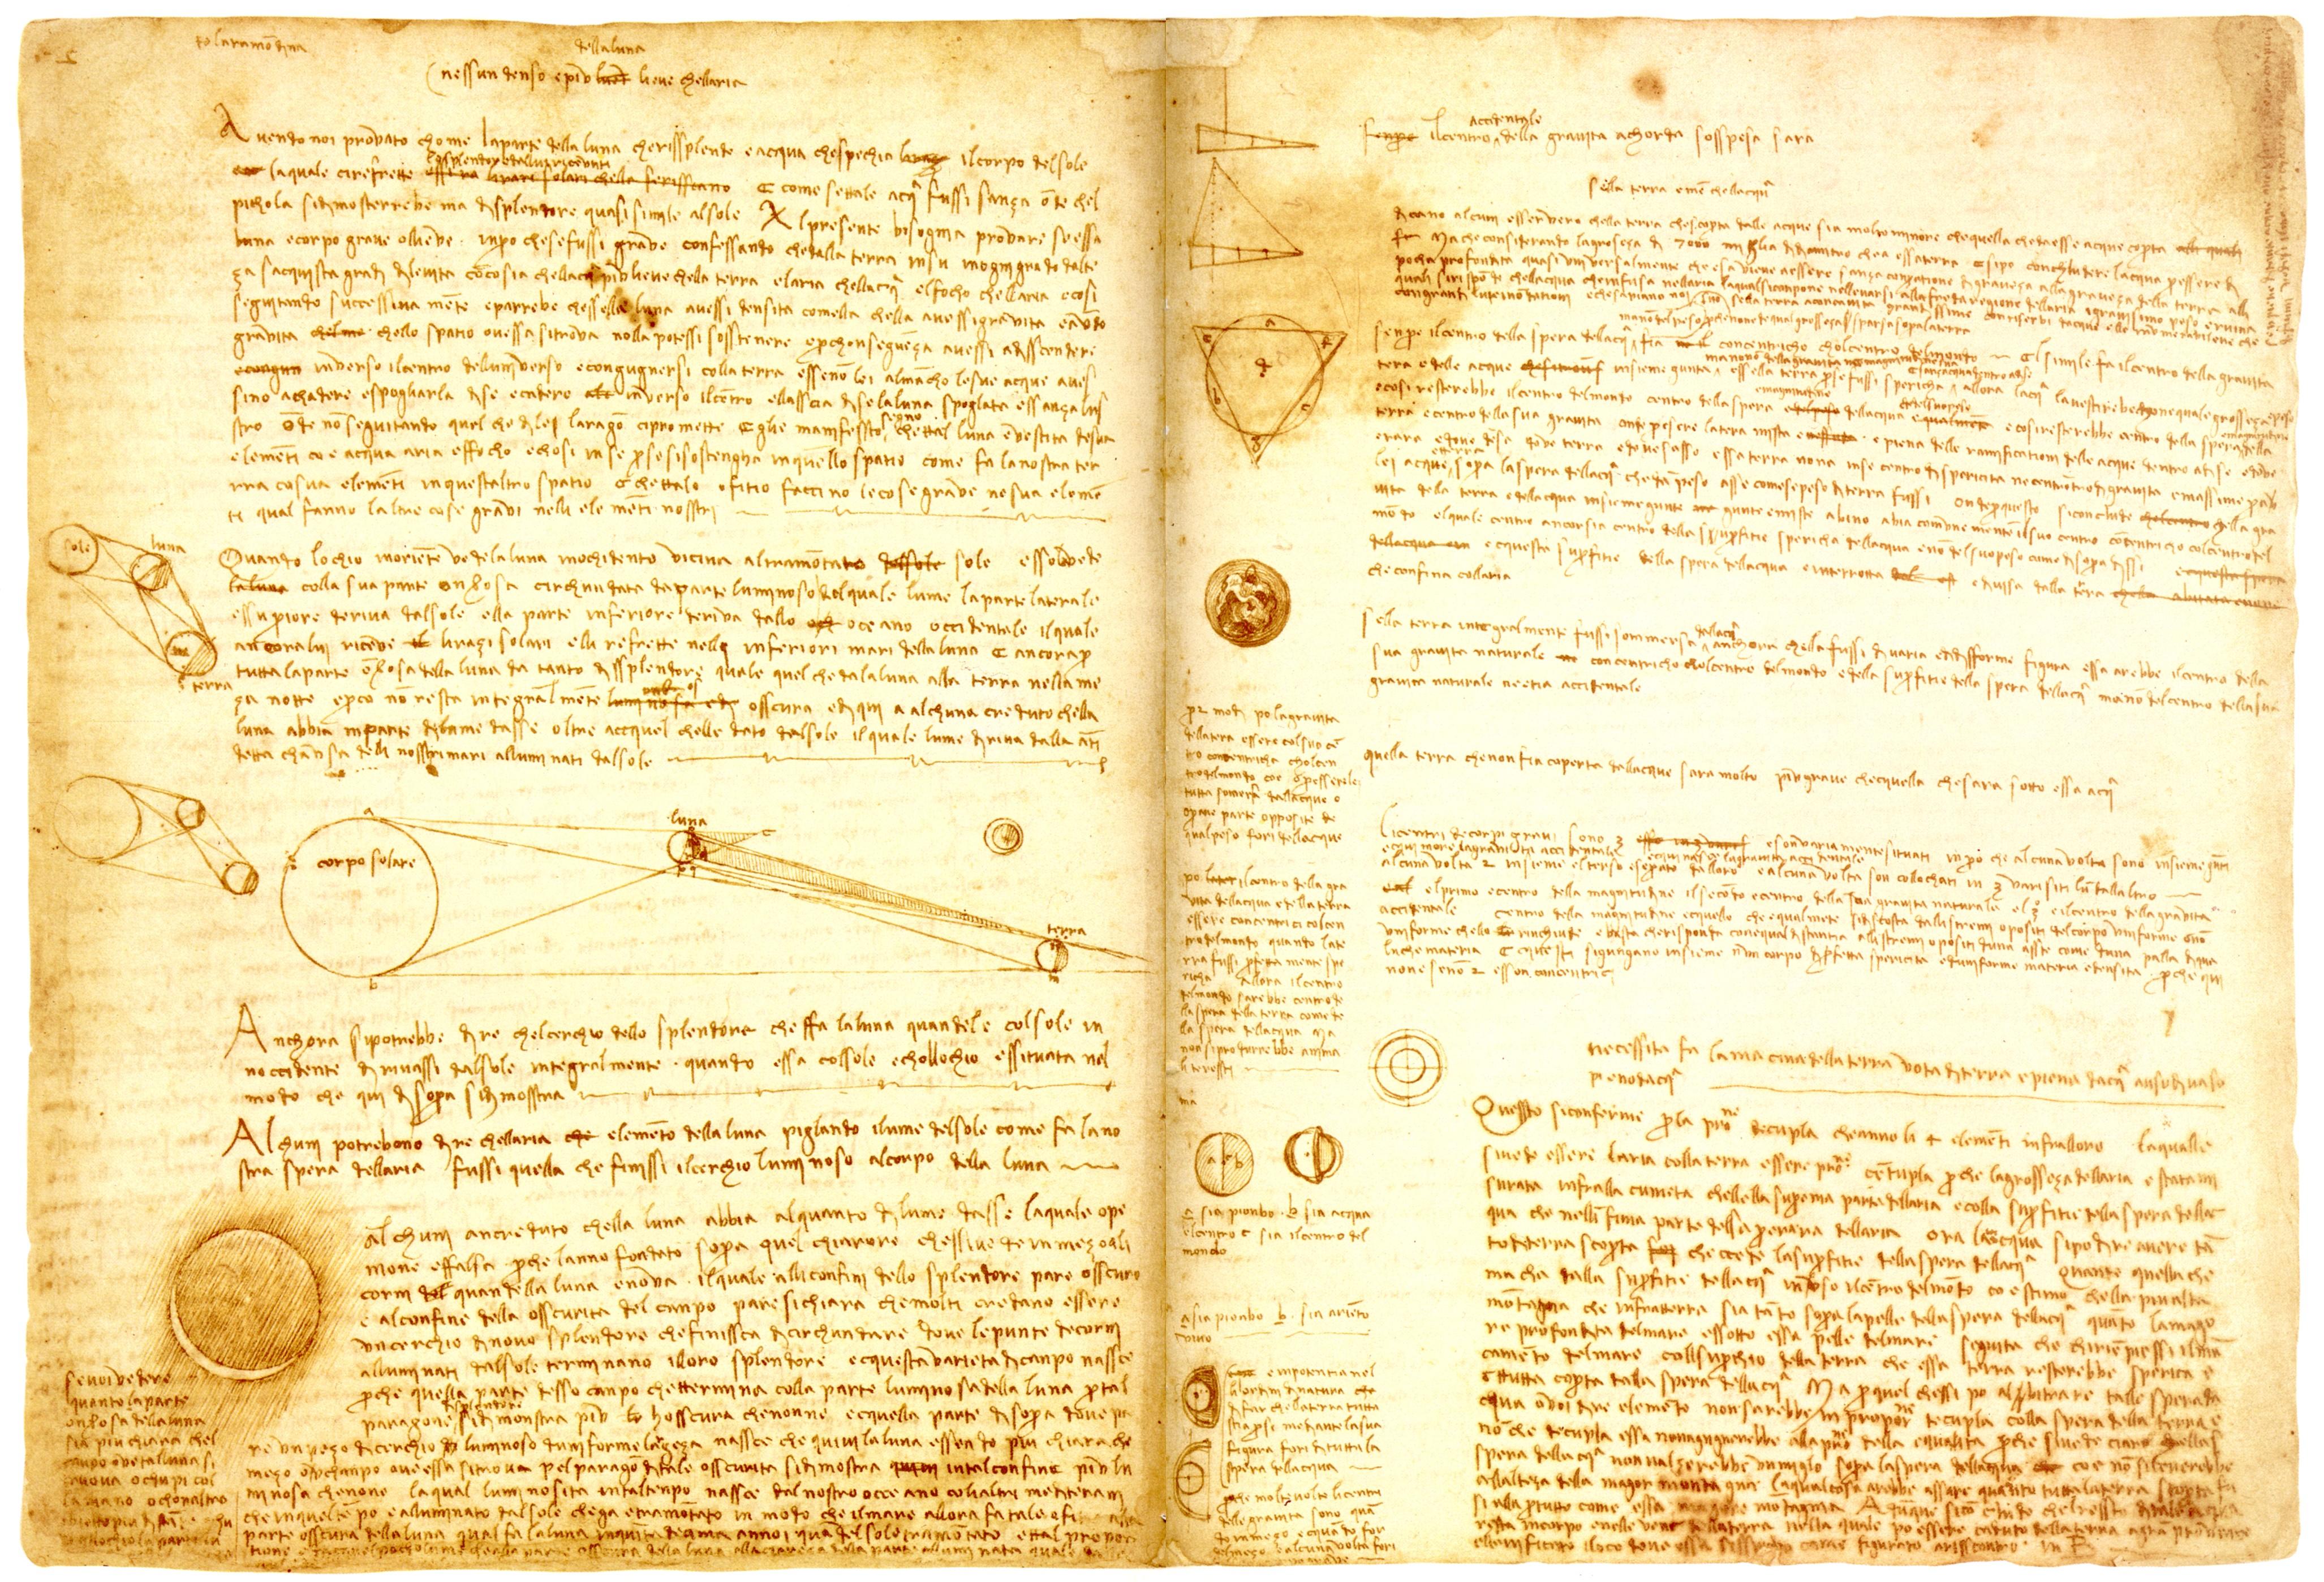 Morning Links: Leonardo da Vinci's Notebook Edition